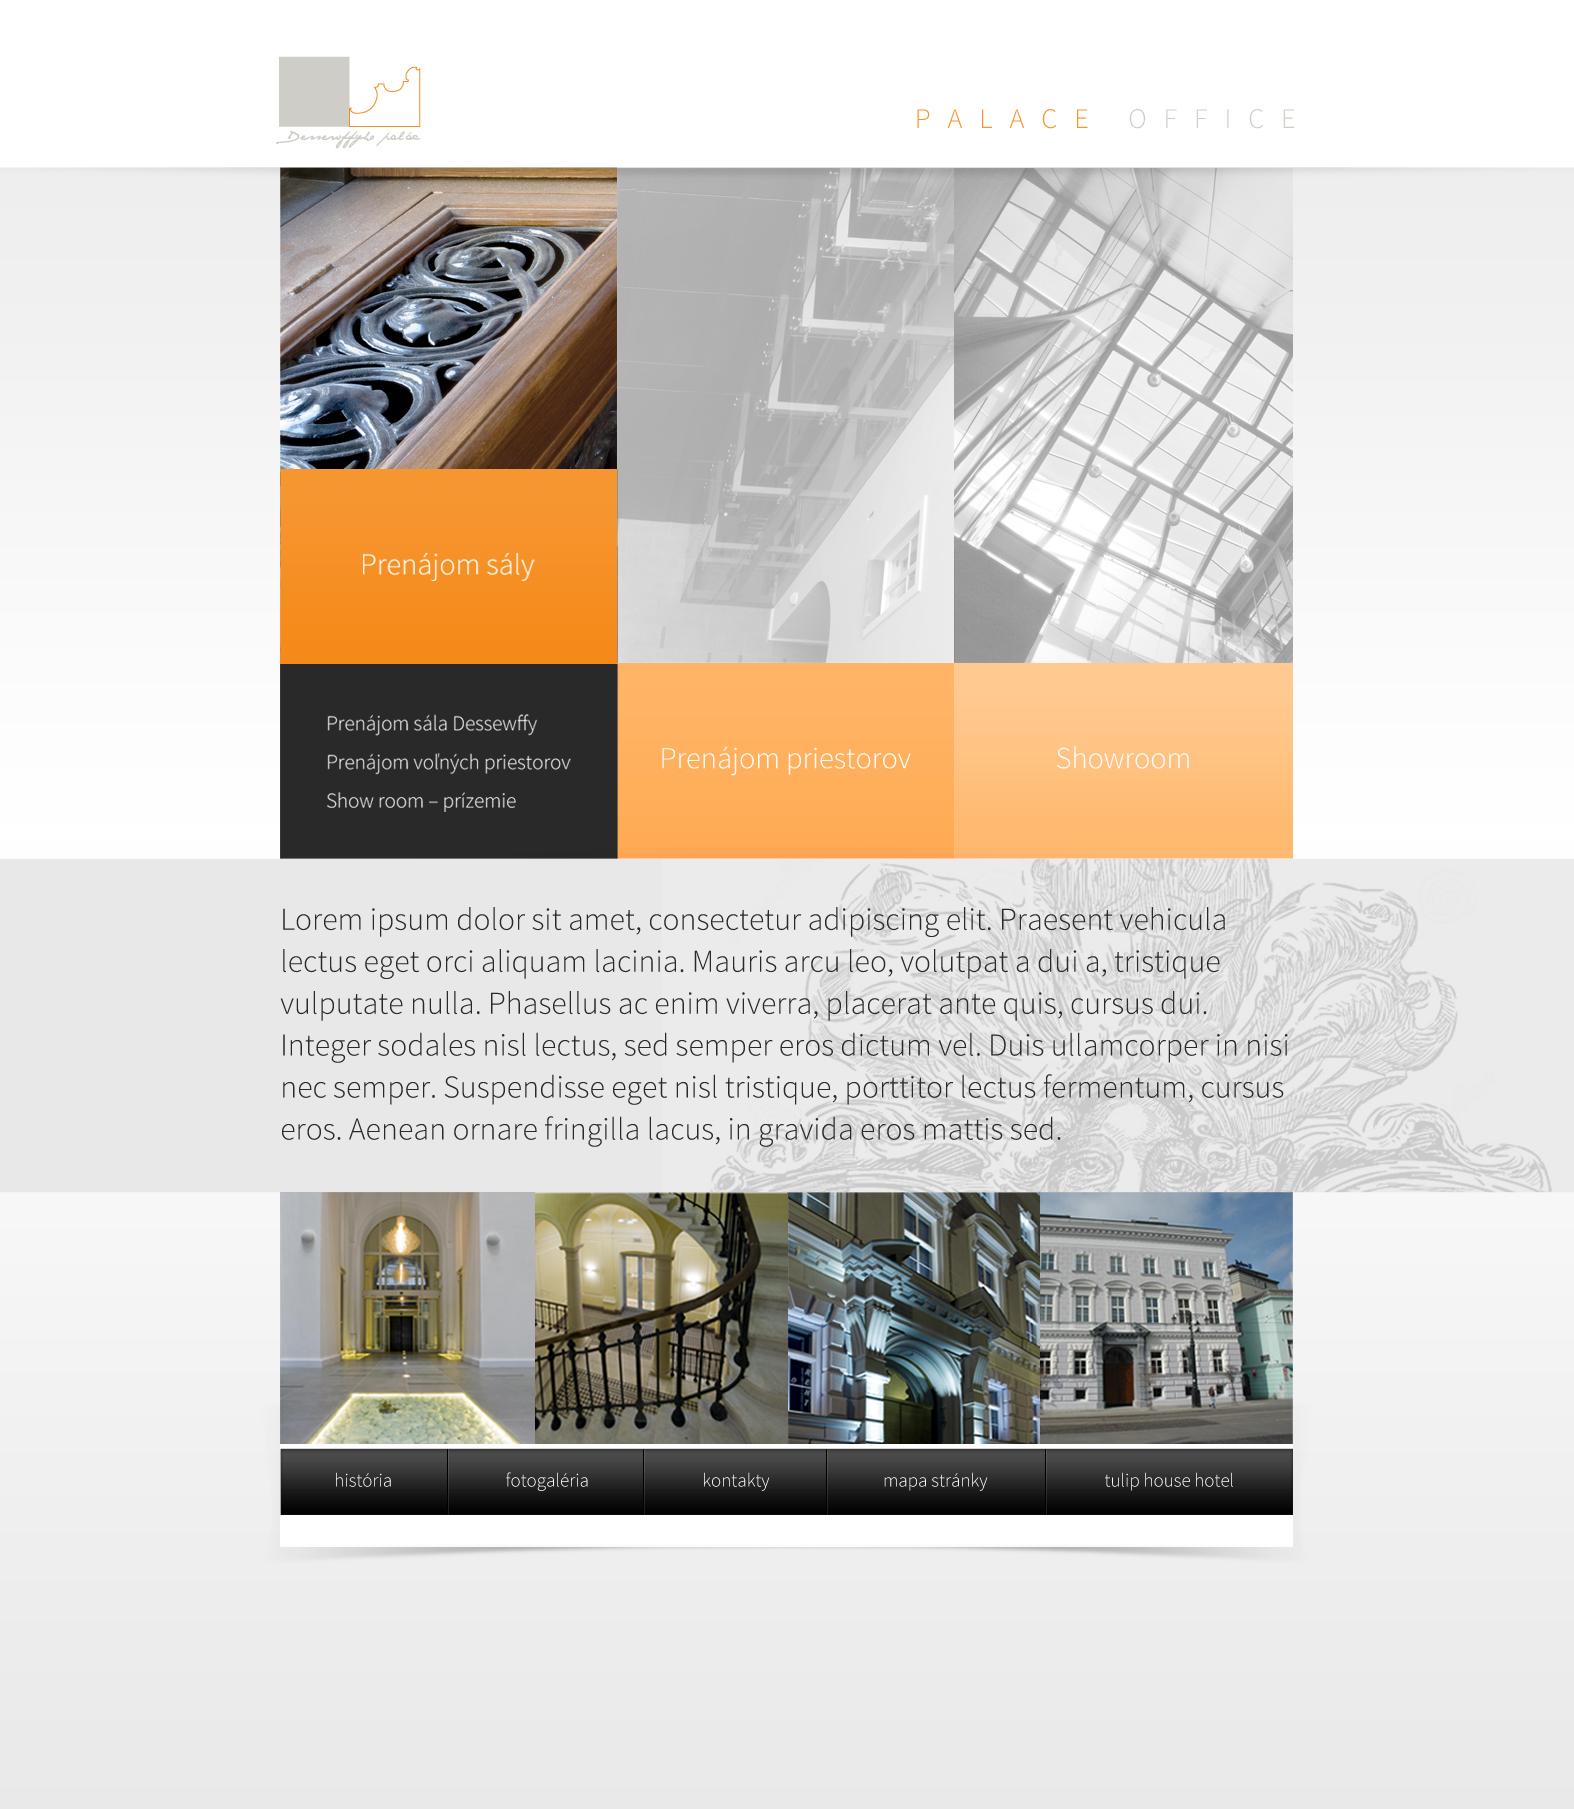 PalaceOffice2_3